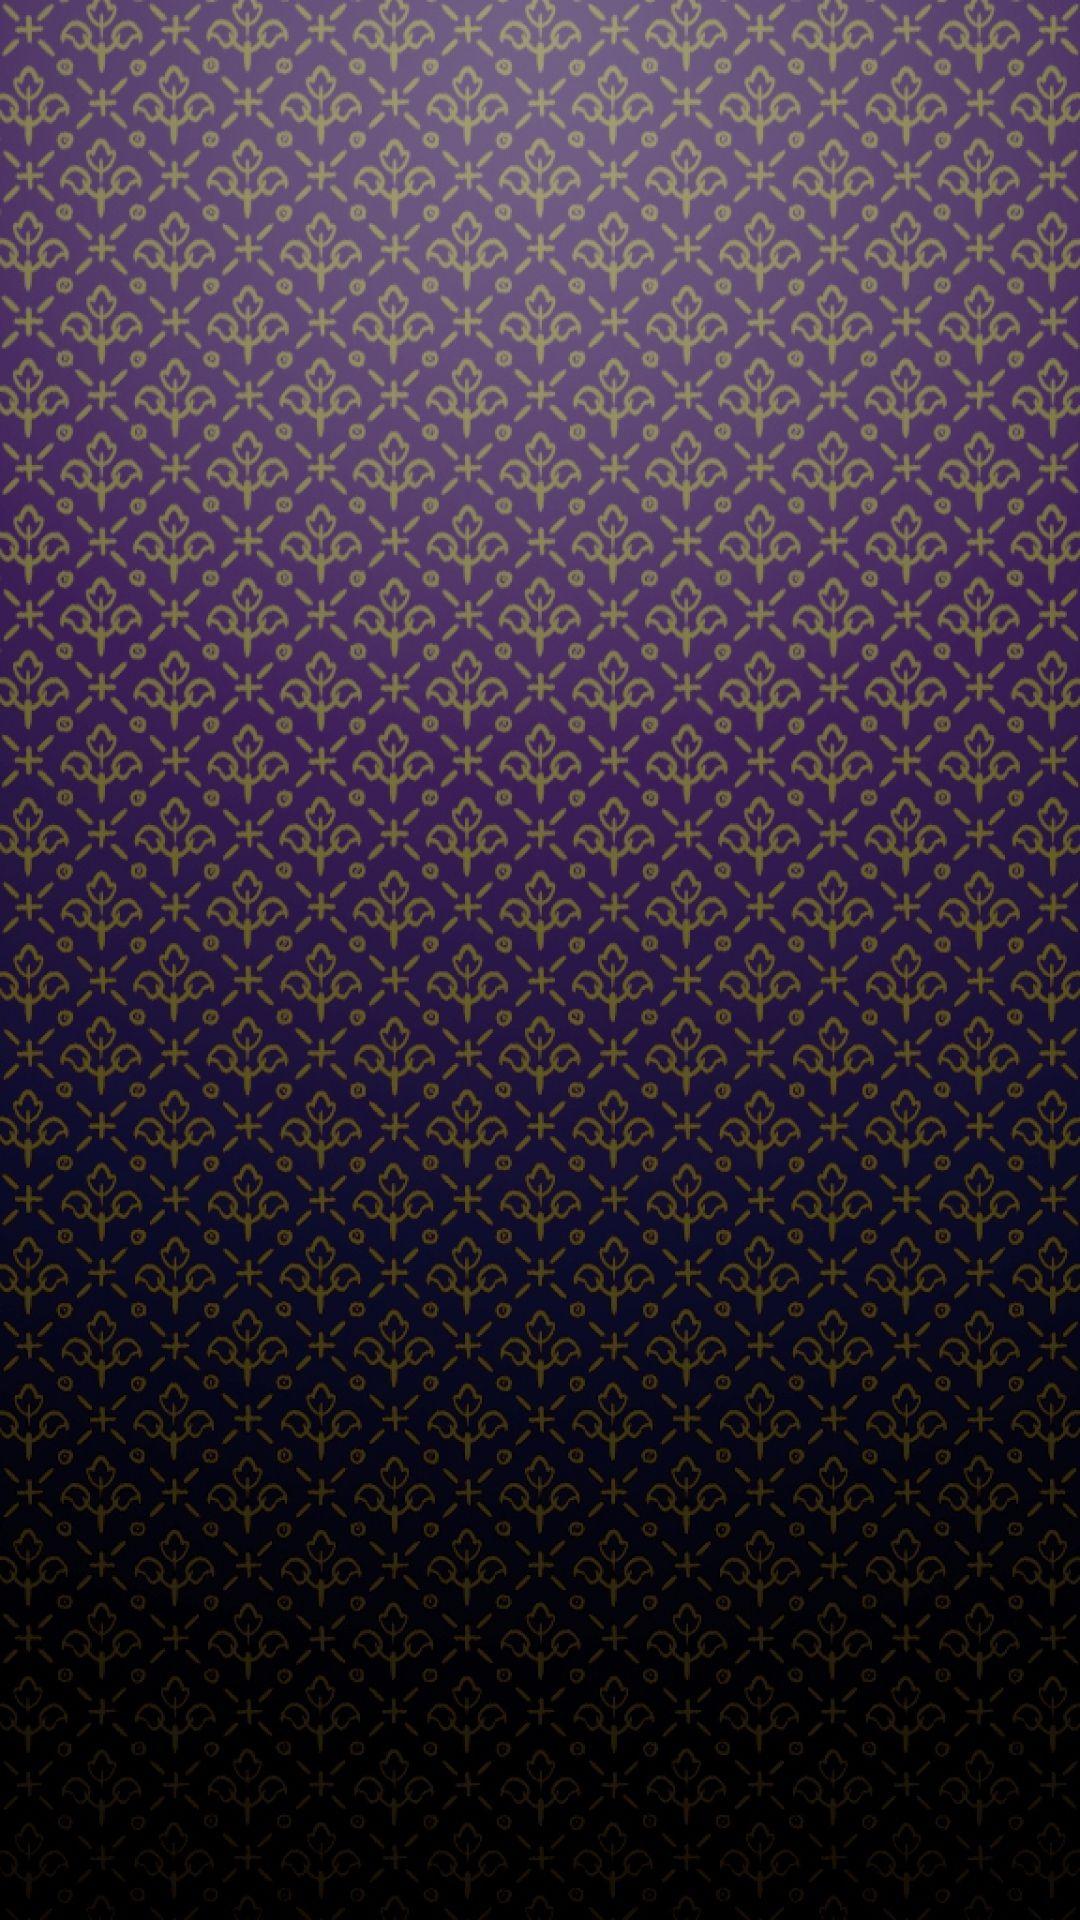 Best Wallpaper Harry Potter Purple - fbee3bde2196ba50e5c9c1c9f02bdaaf  Graphic_444064.jpg